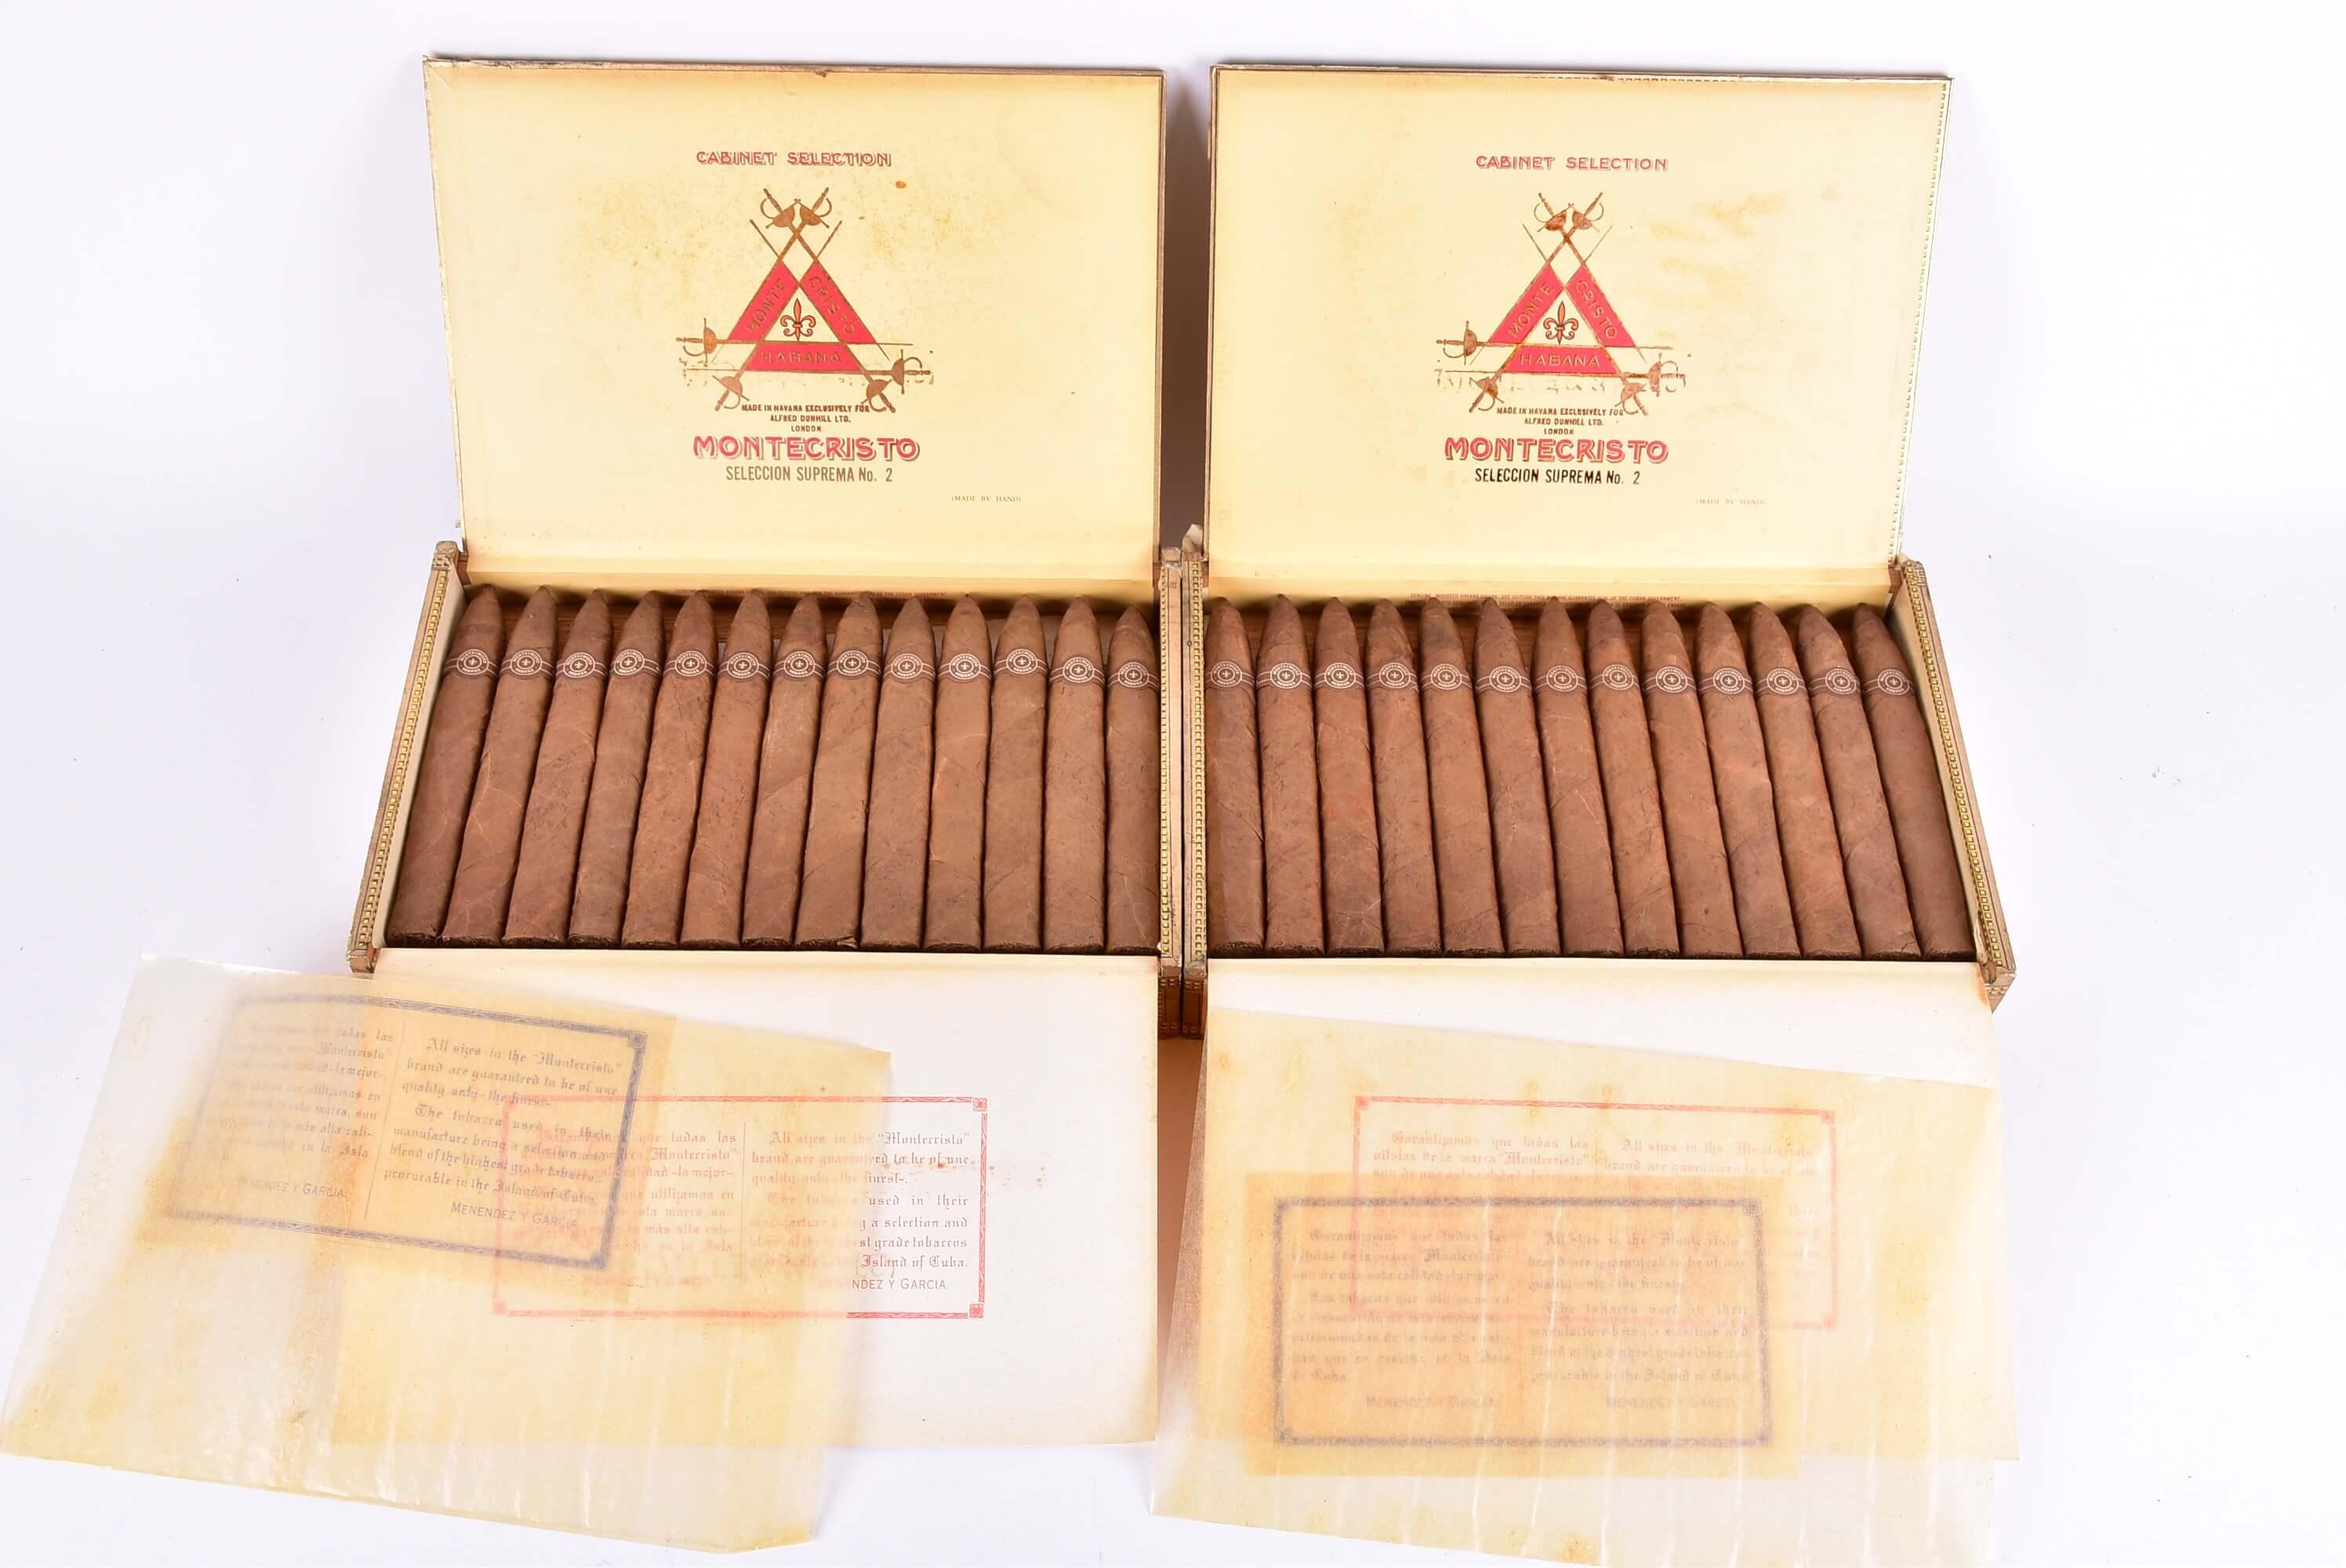 Dunhill Montecristo Seleccion Suprema Cigars